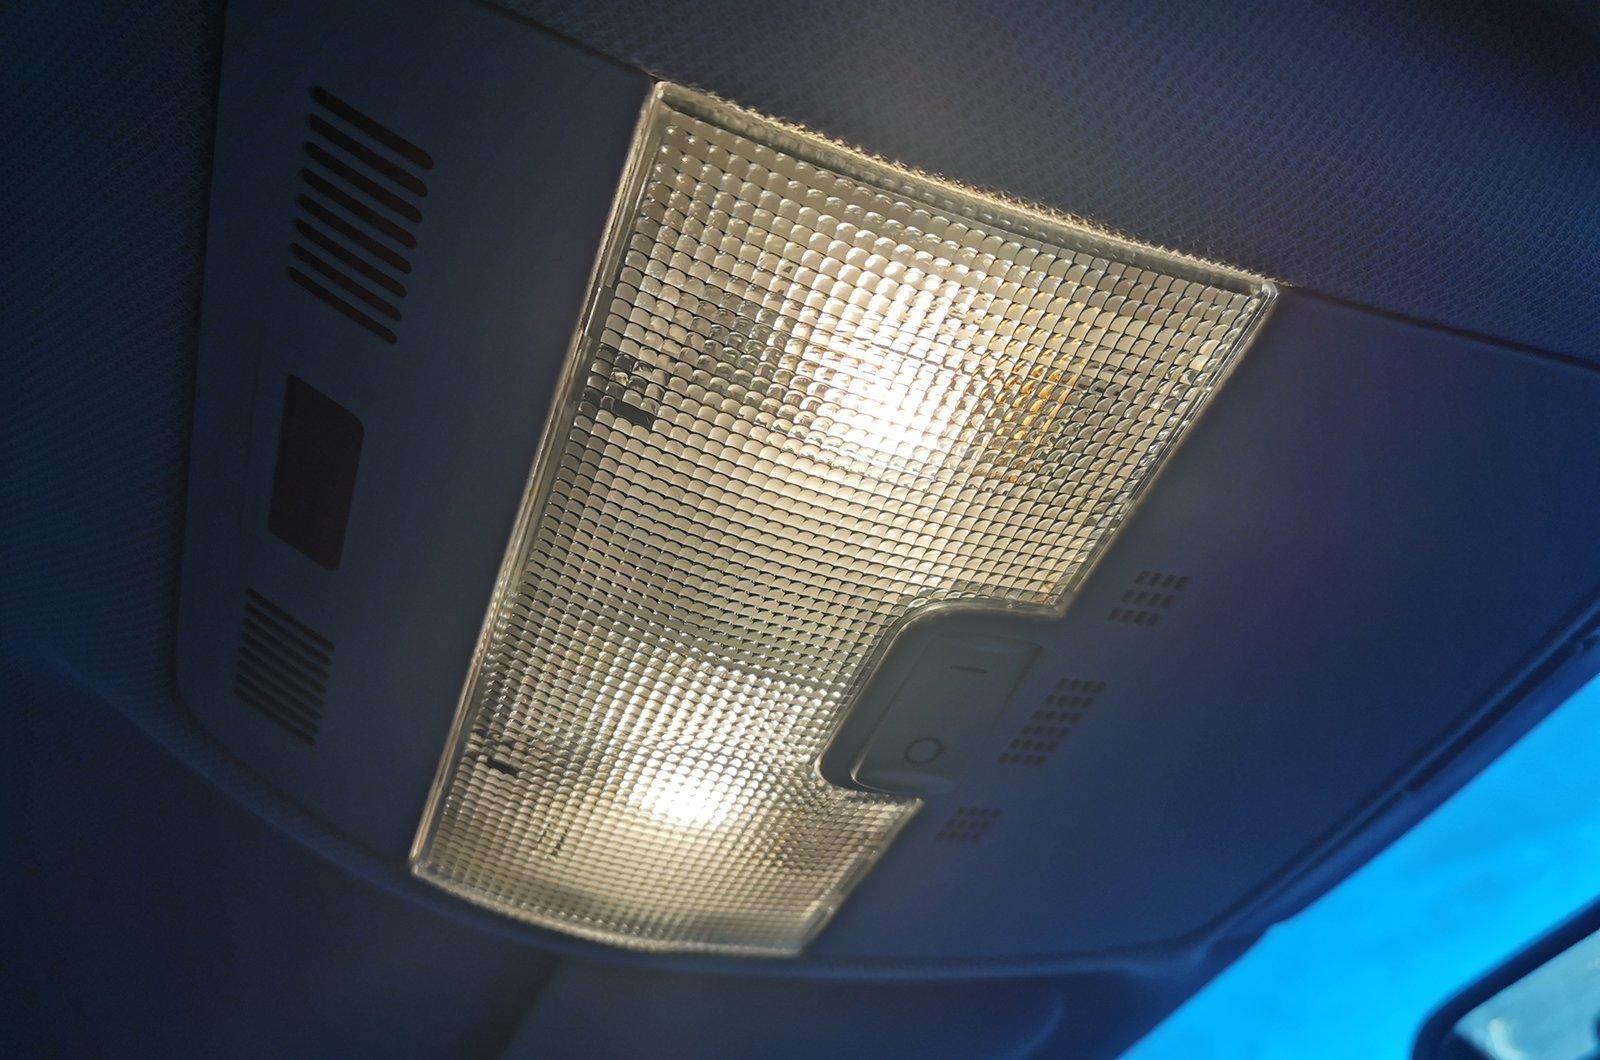 2003 Audi A3 interior light